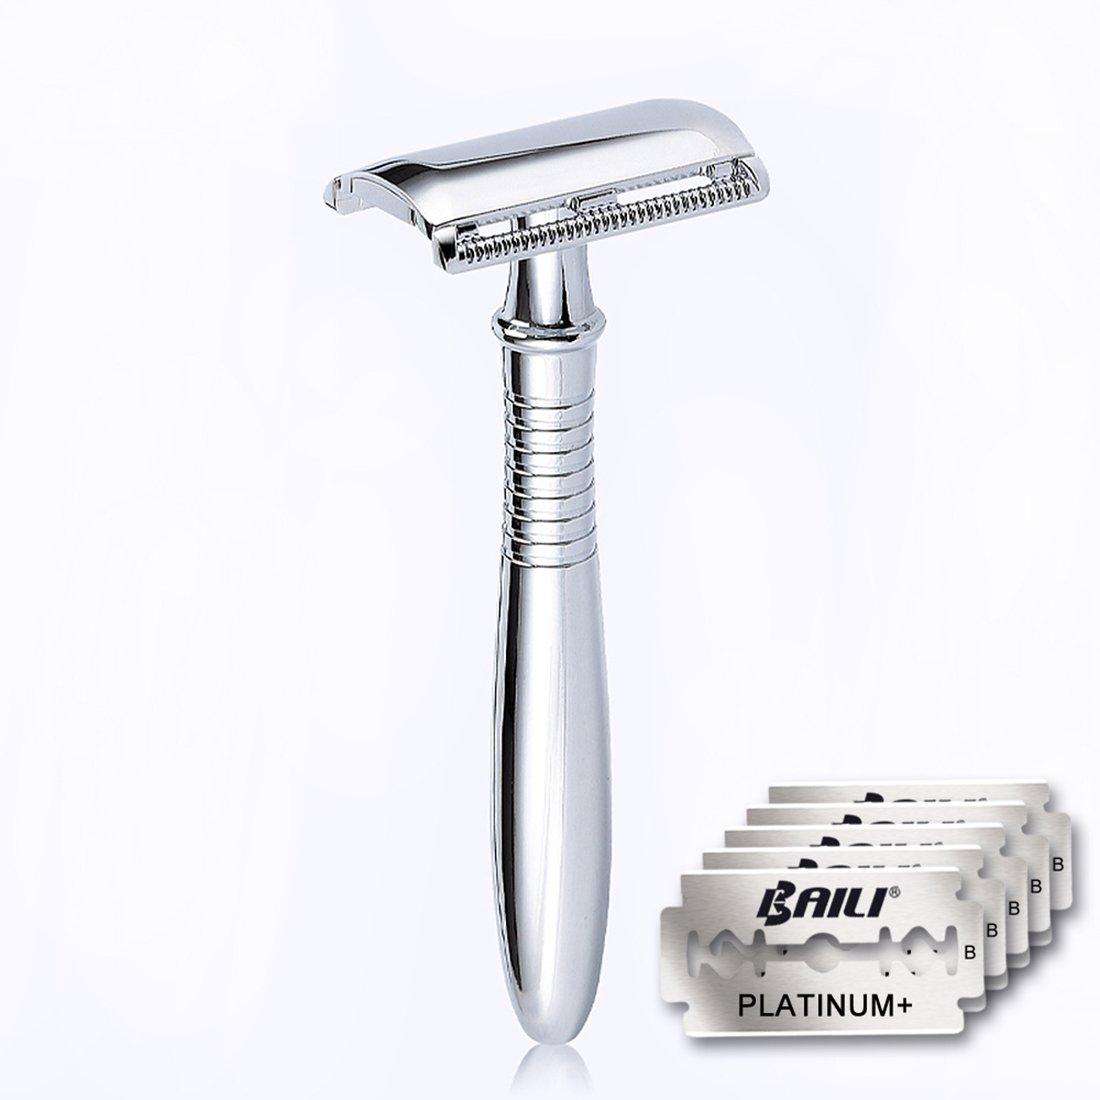 BAILI Wet Shaving Twin-bladed Safety Razor Retro Chrome Long Handle Men's Stainless Shaver with 5 Platinum+ American Blades, BD191 WEIDI BAILI